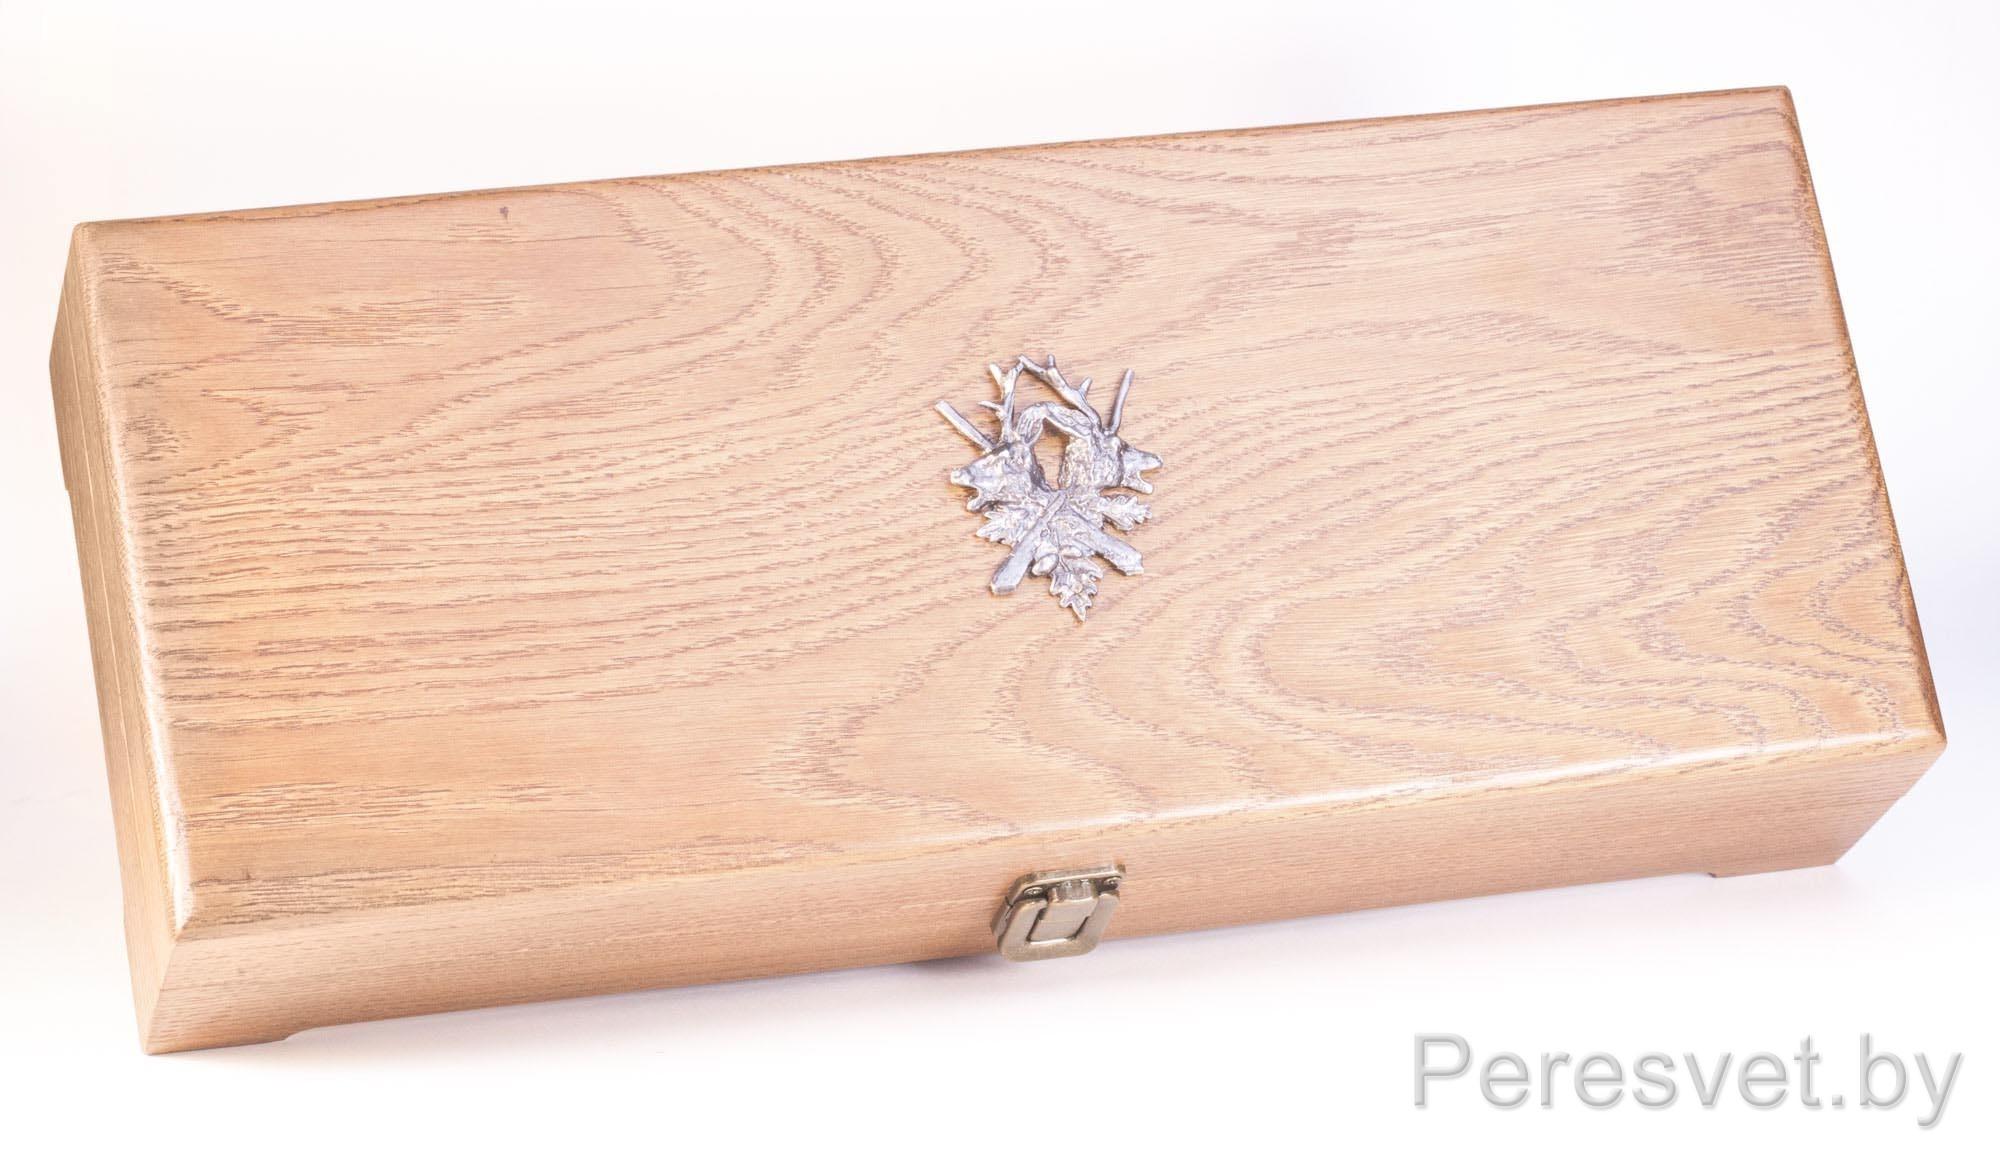 Рюмки подарочный набор в дубовой упаковке Царская охота бронза на peresvet.by